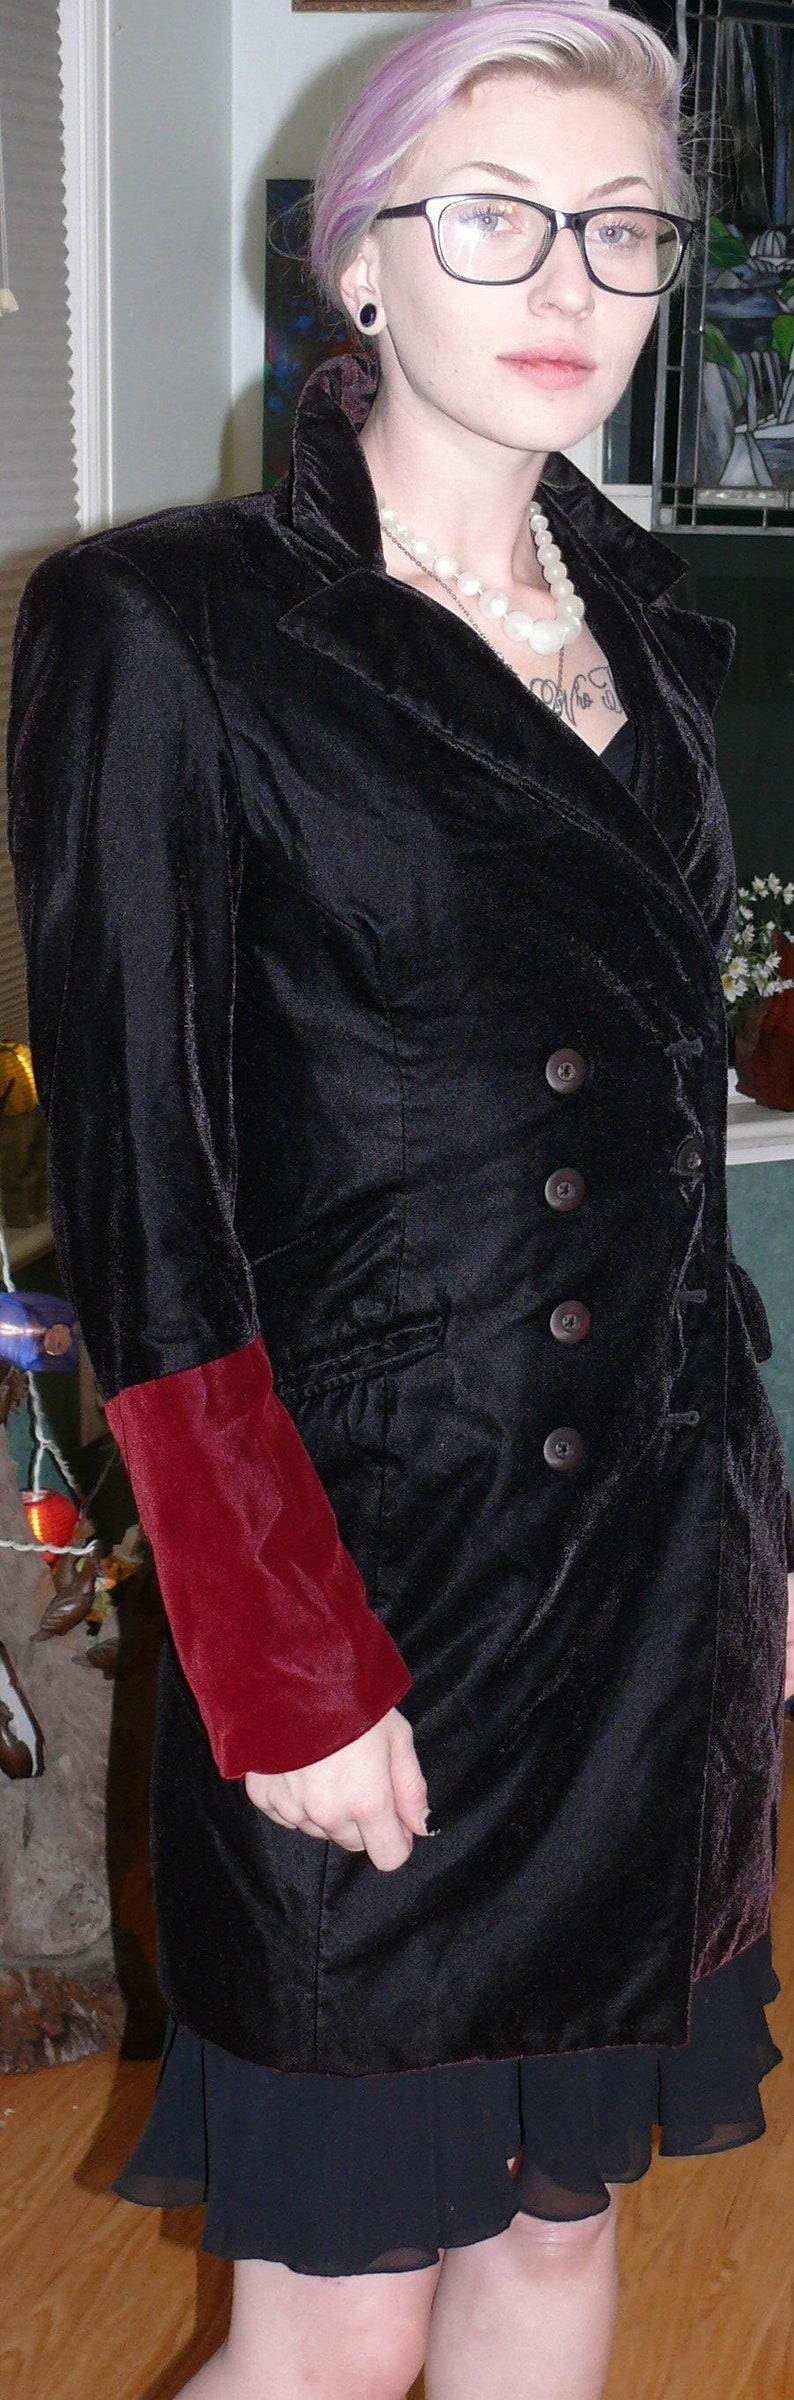 Black and red velvet double breasted blazer Bisou Bisou